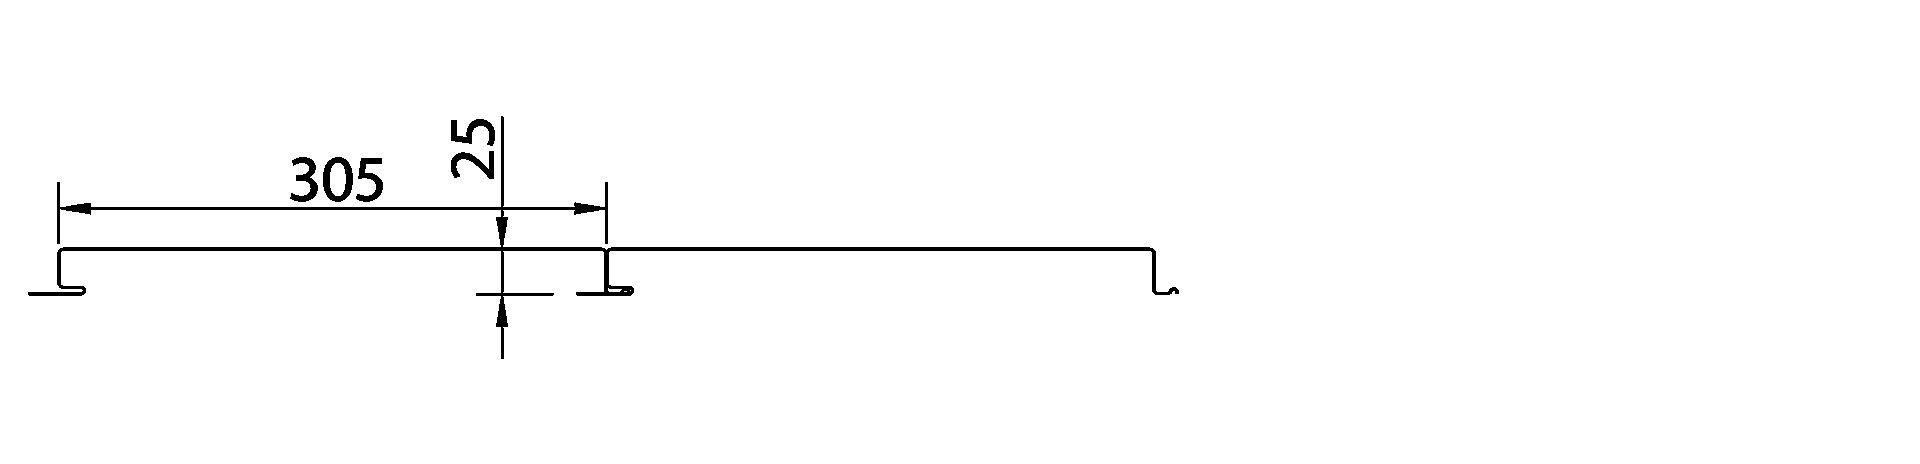 Perfil Cielorraso Fachada (Flush Panel) de acero Ternium